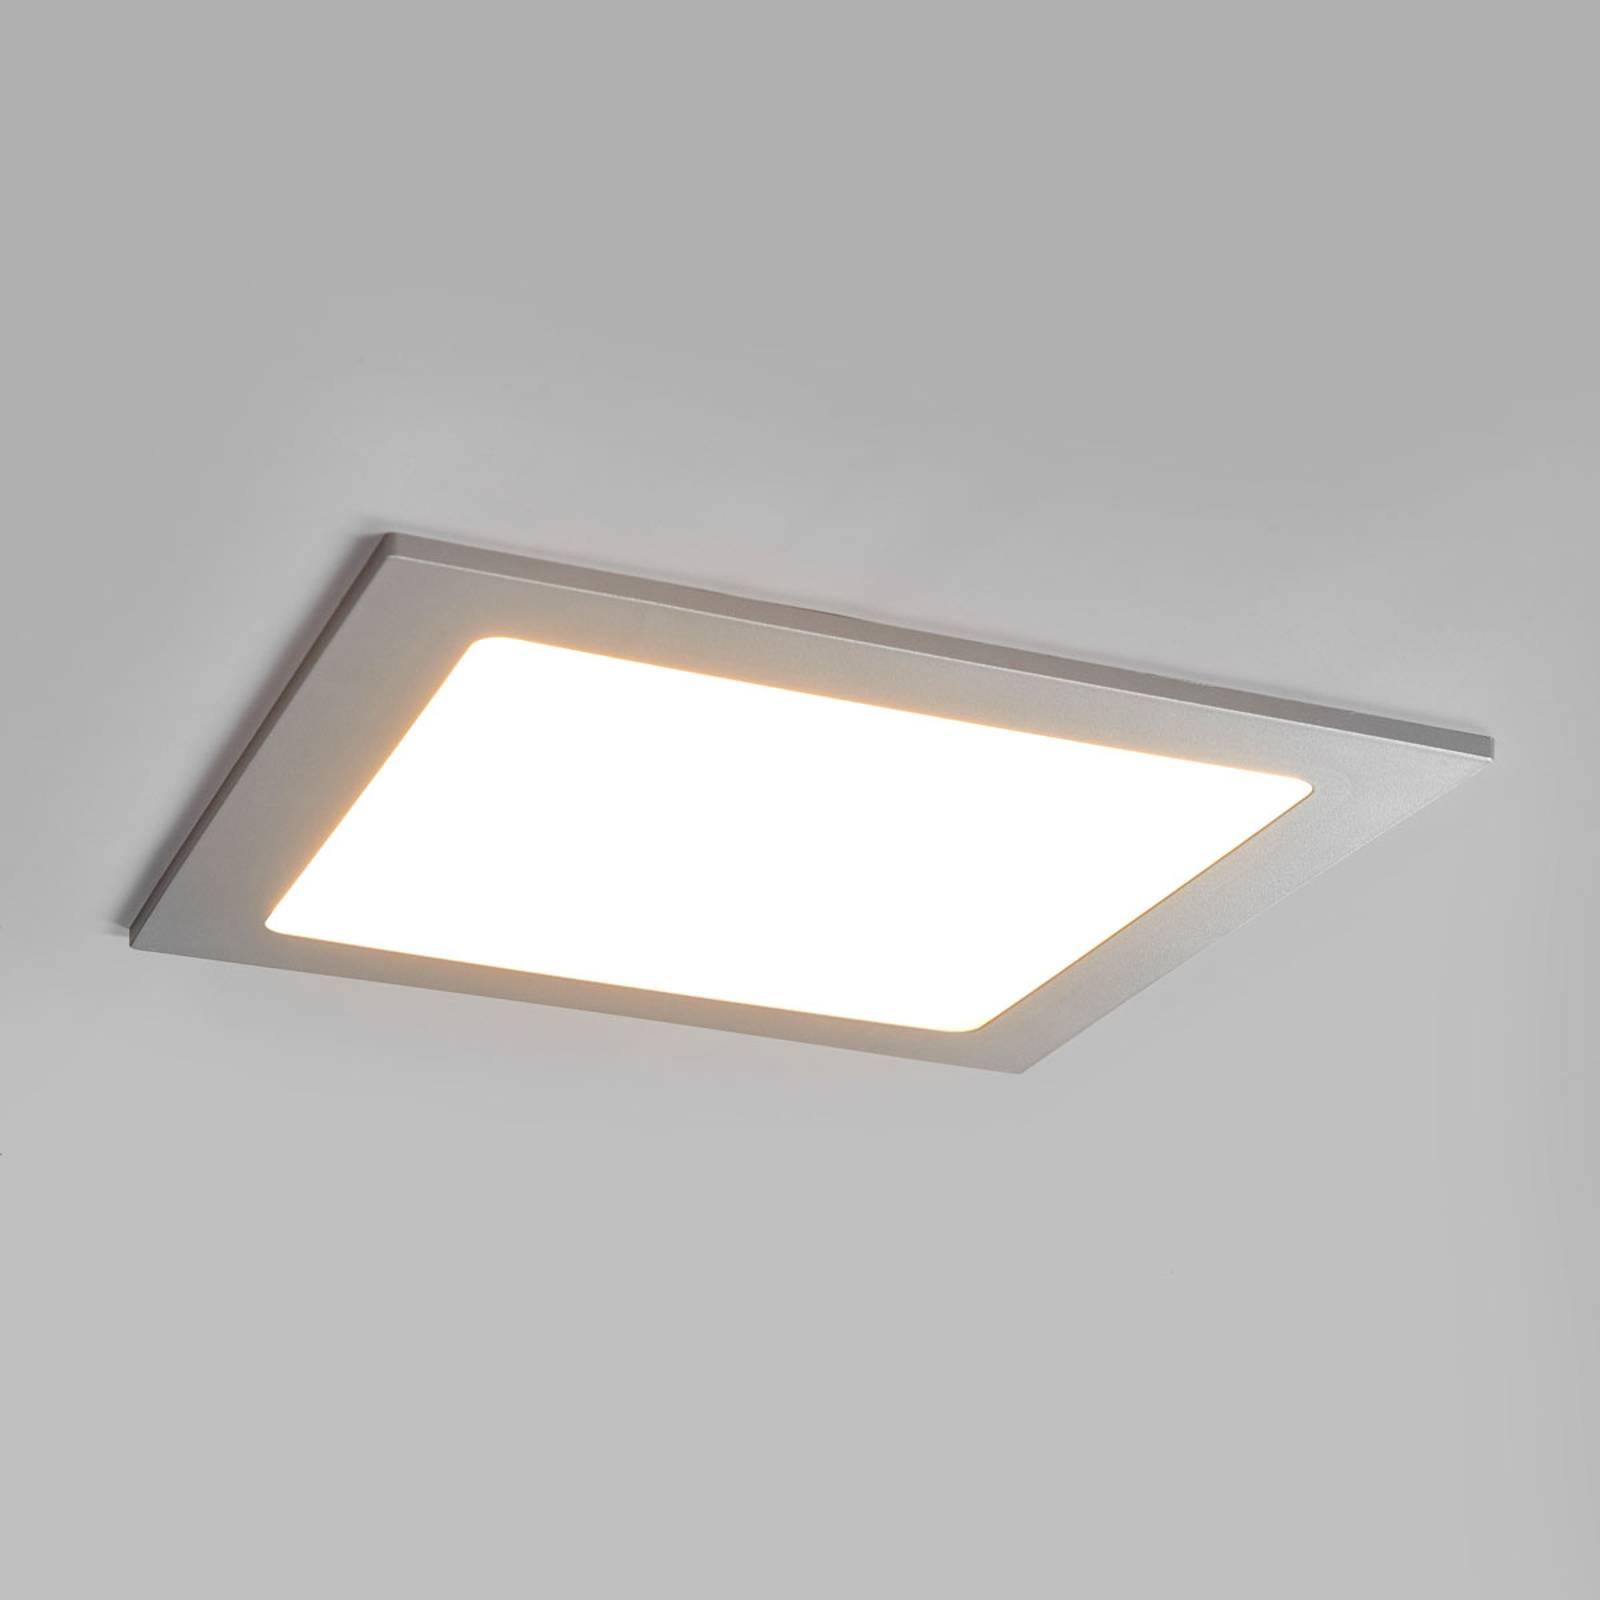 LED-kohdevalo Joki hopea 3 000 K kulmikas 22 cm